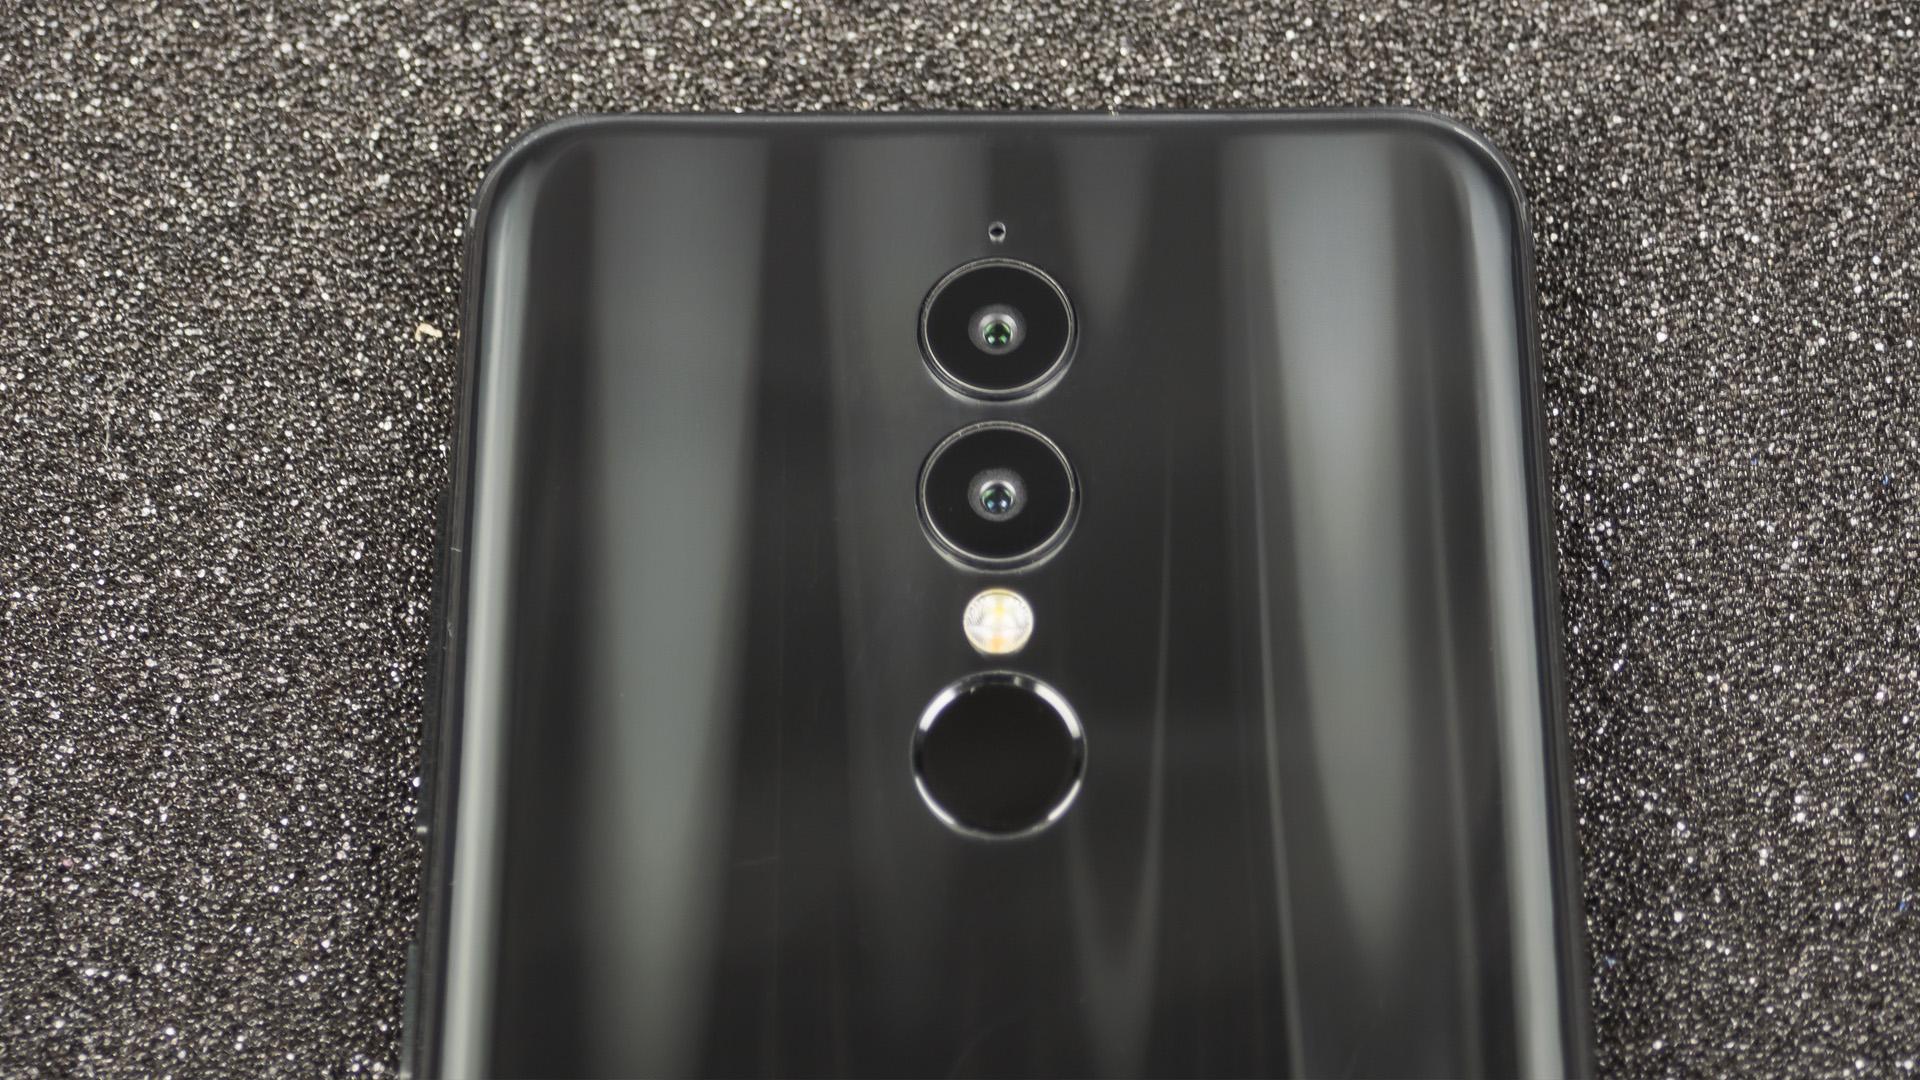 камера umidigi a1 pro